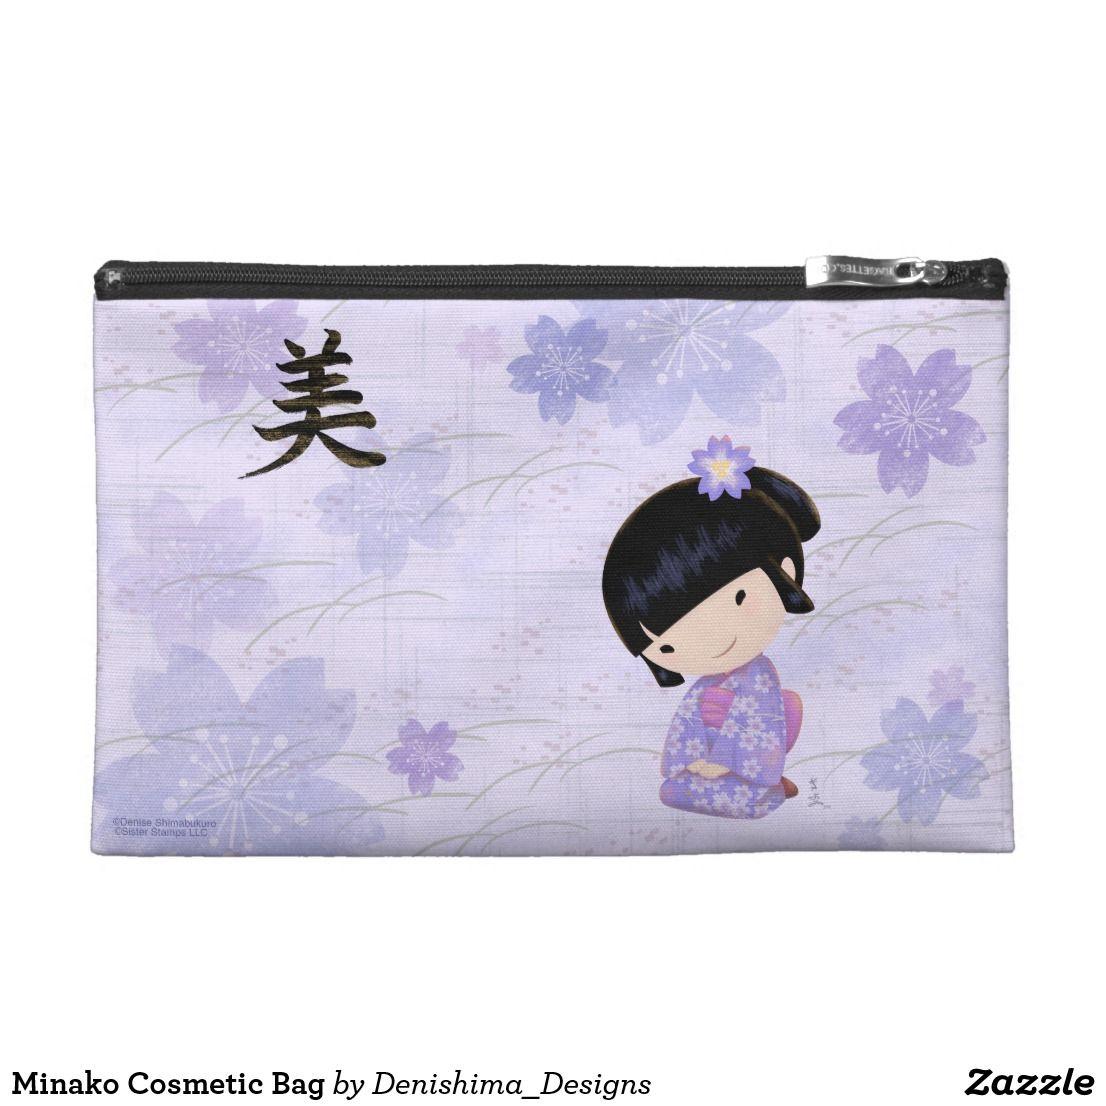 Minako Cosmetic Bag Travel accessories bags